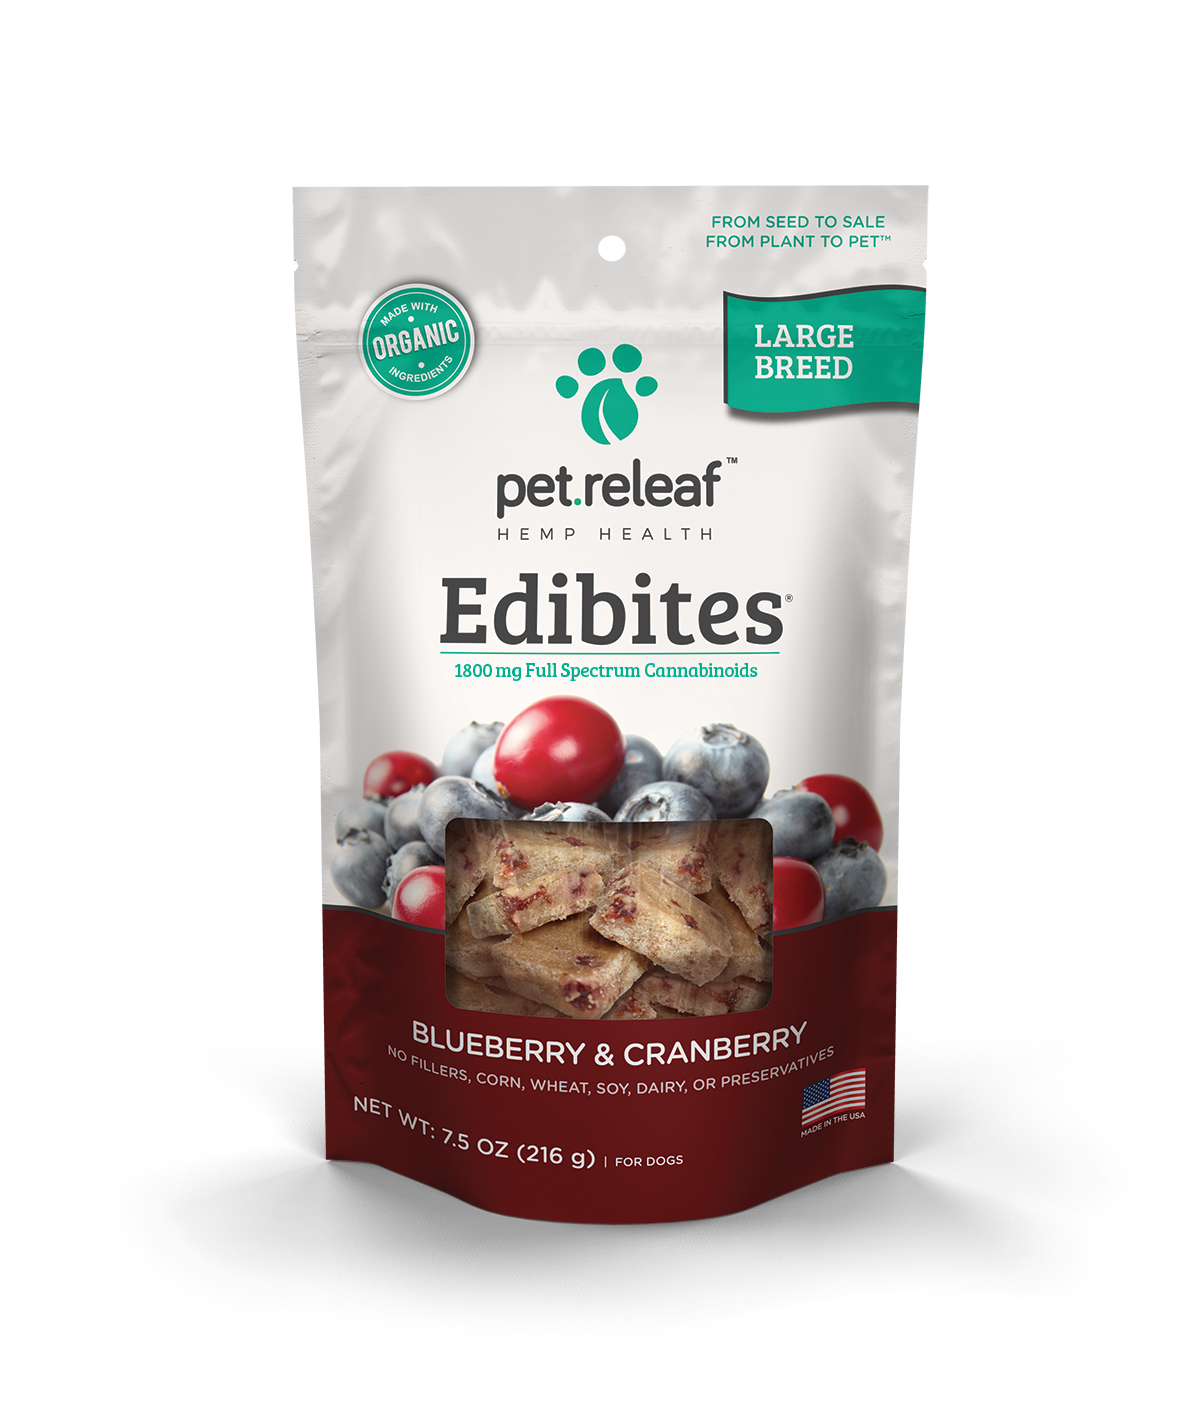 Large Breed CBD Dog Treats – Blueberry Cranberry Edibites Elixinol